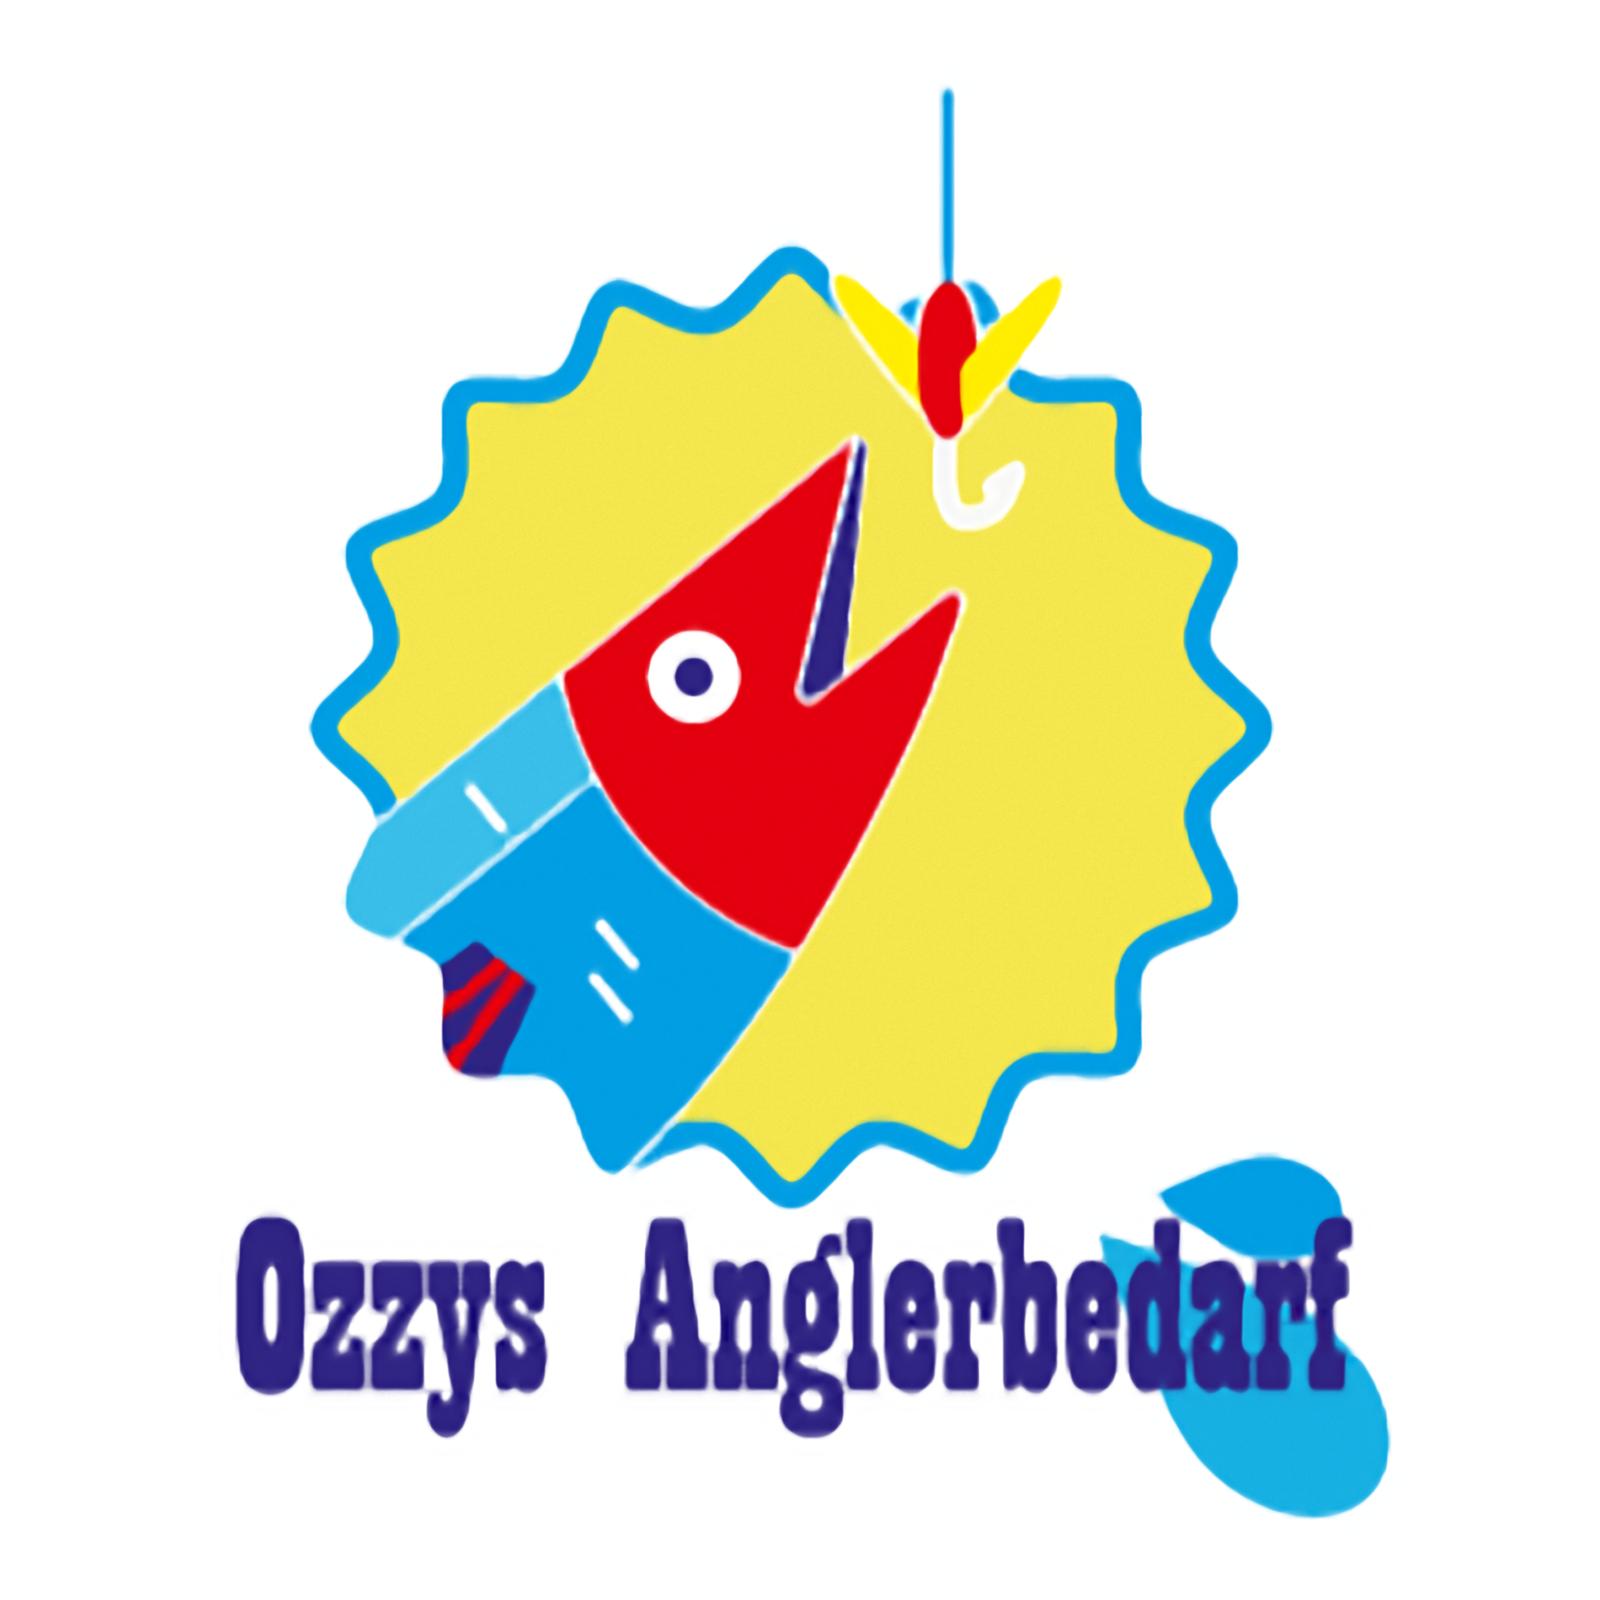 Logo Ozzys Anglerbedarf - SmillaEnlarger, sharp | BANNERKÖNIG